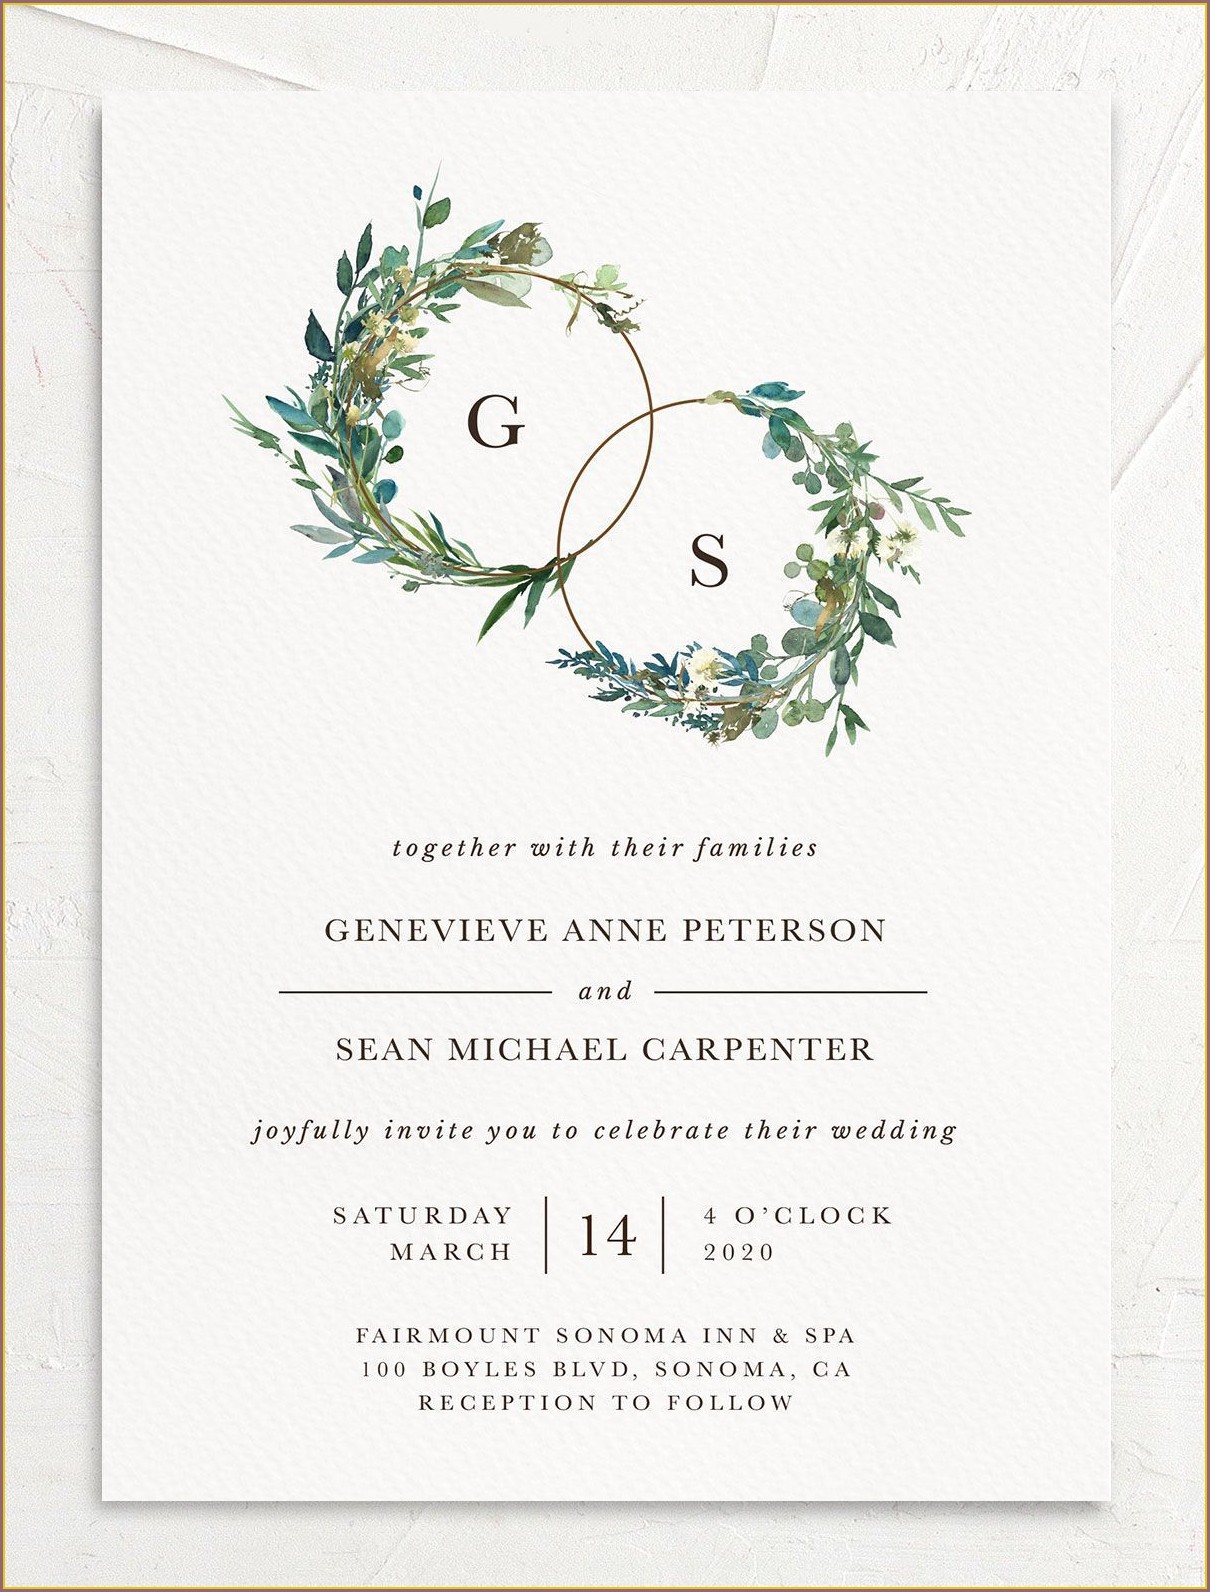 Wedding Invitations With Greenery